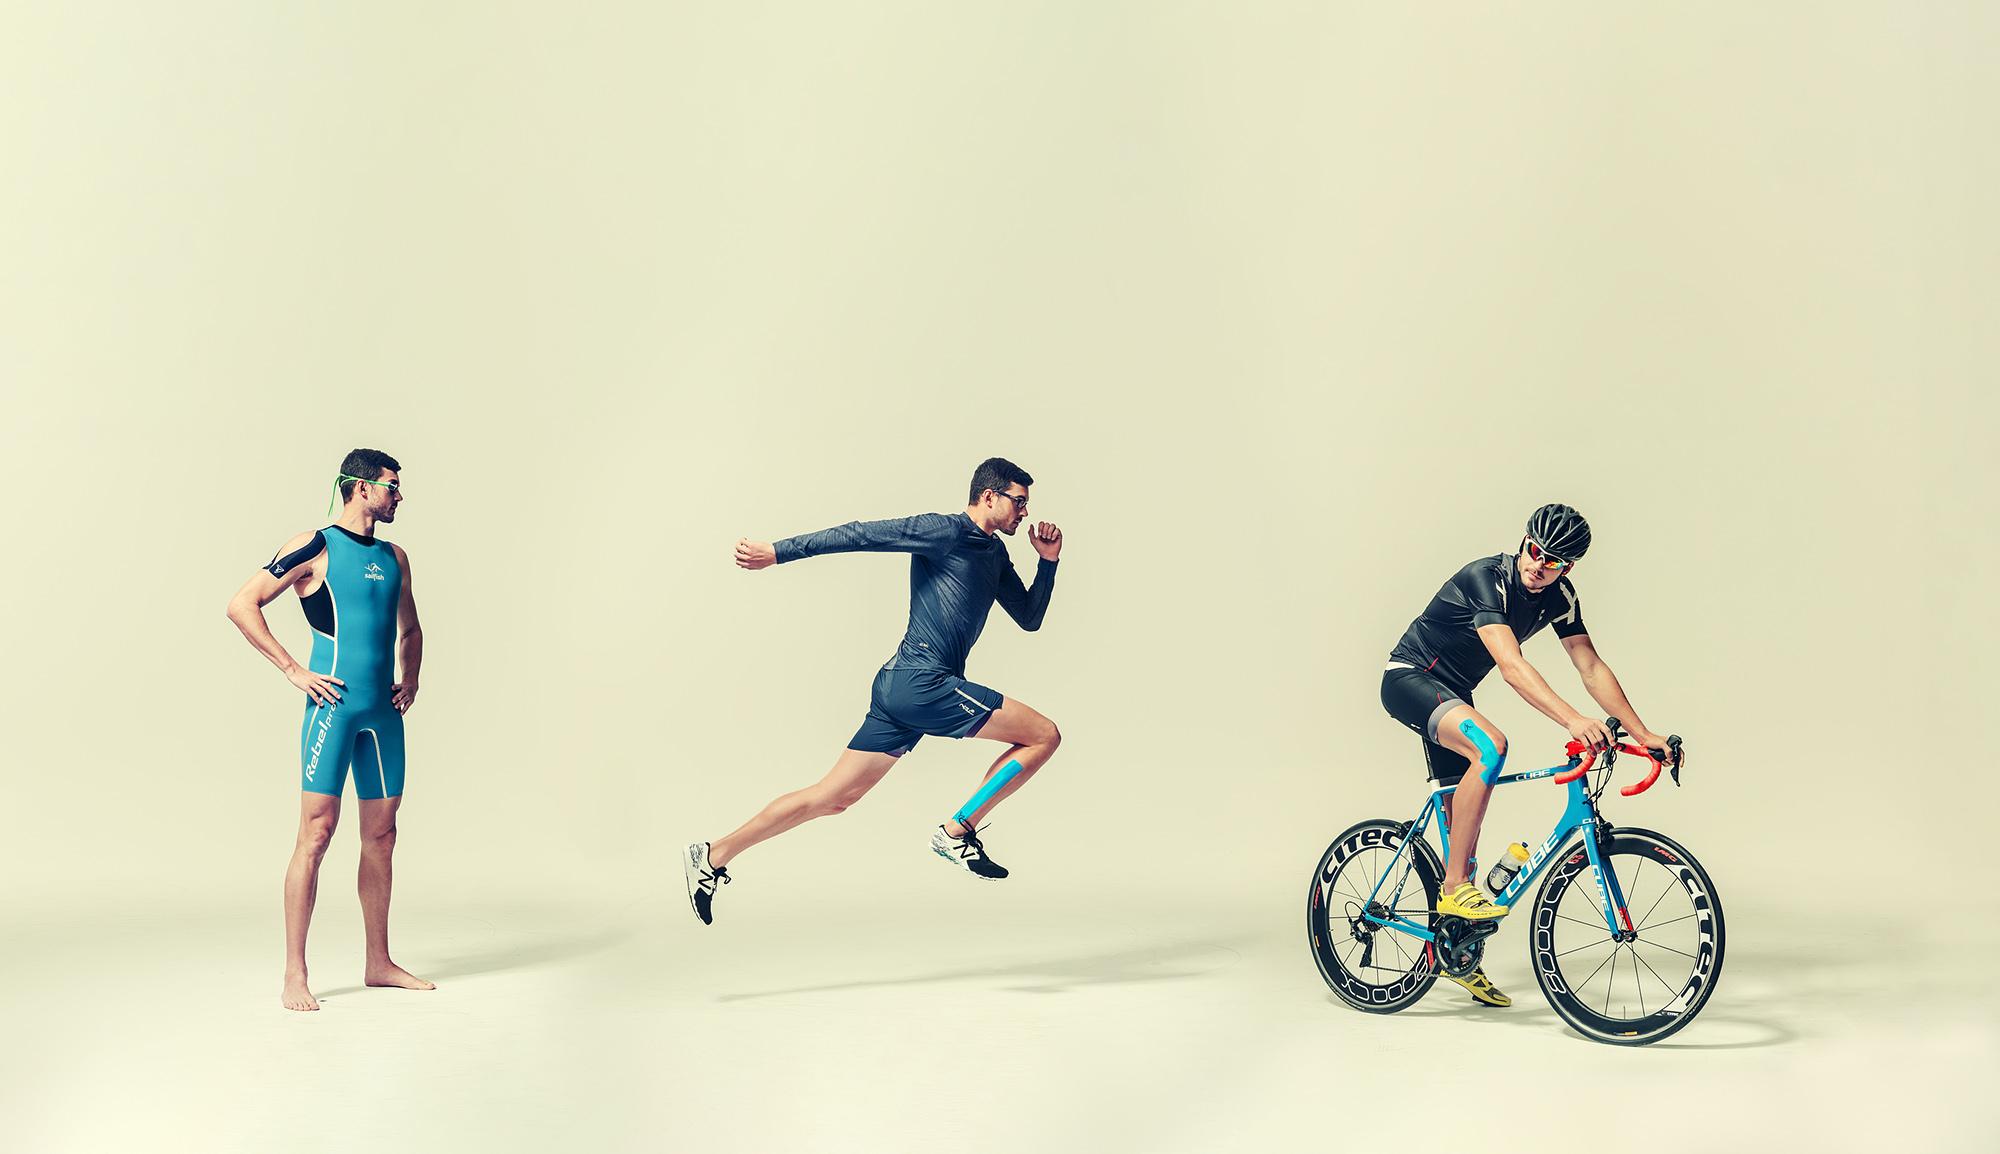 sportfotografie-triathlon.jpg